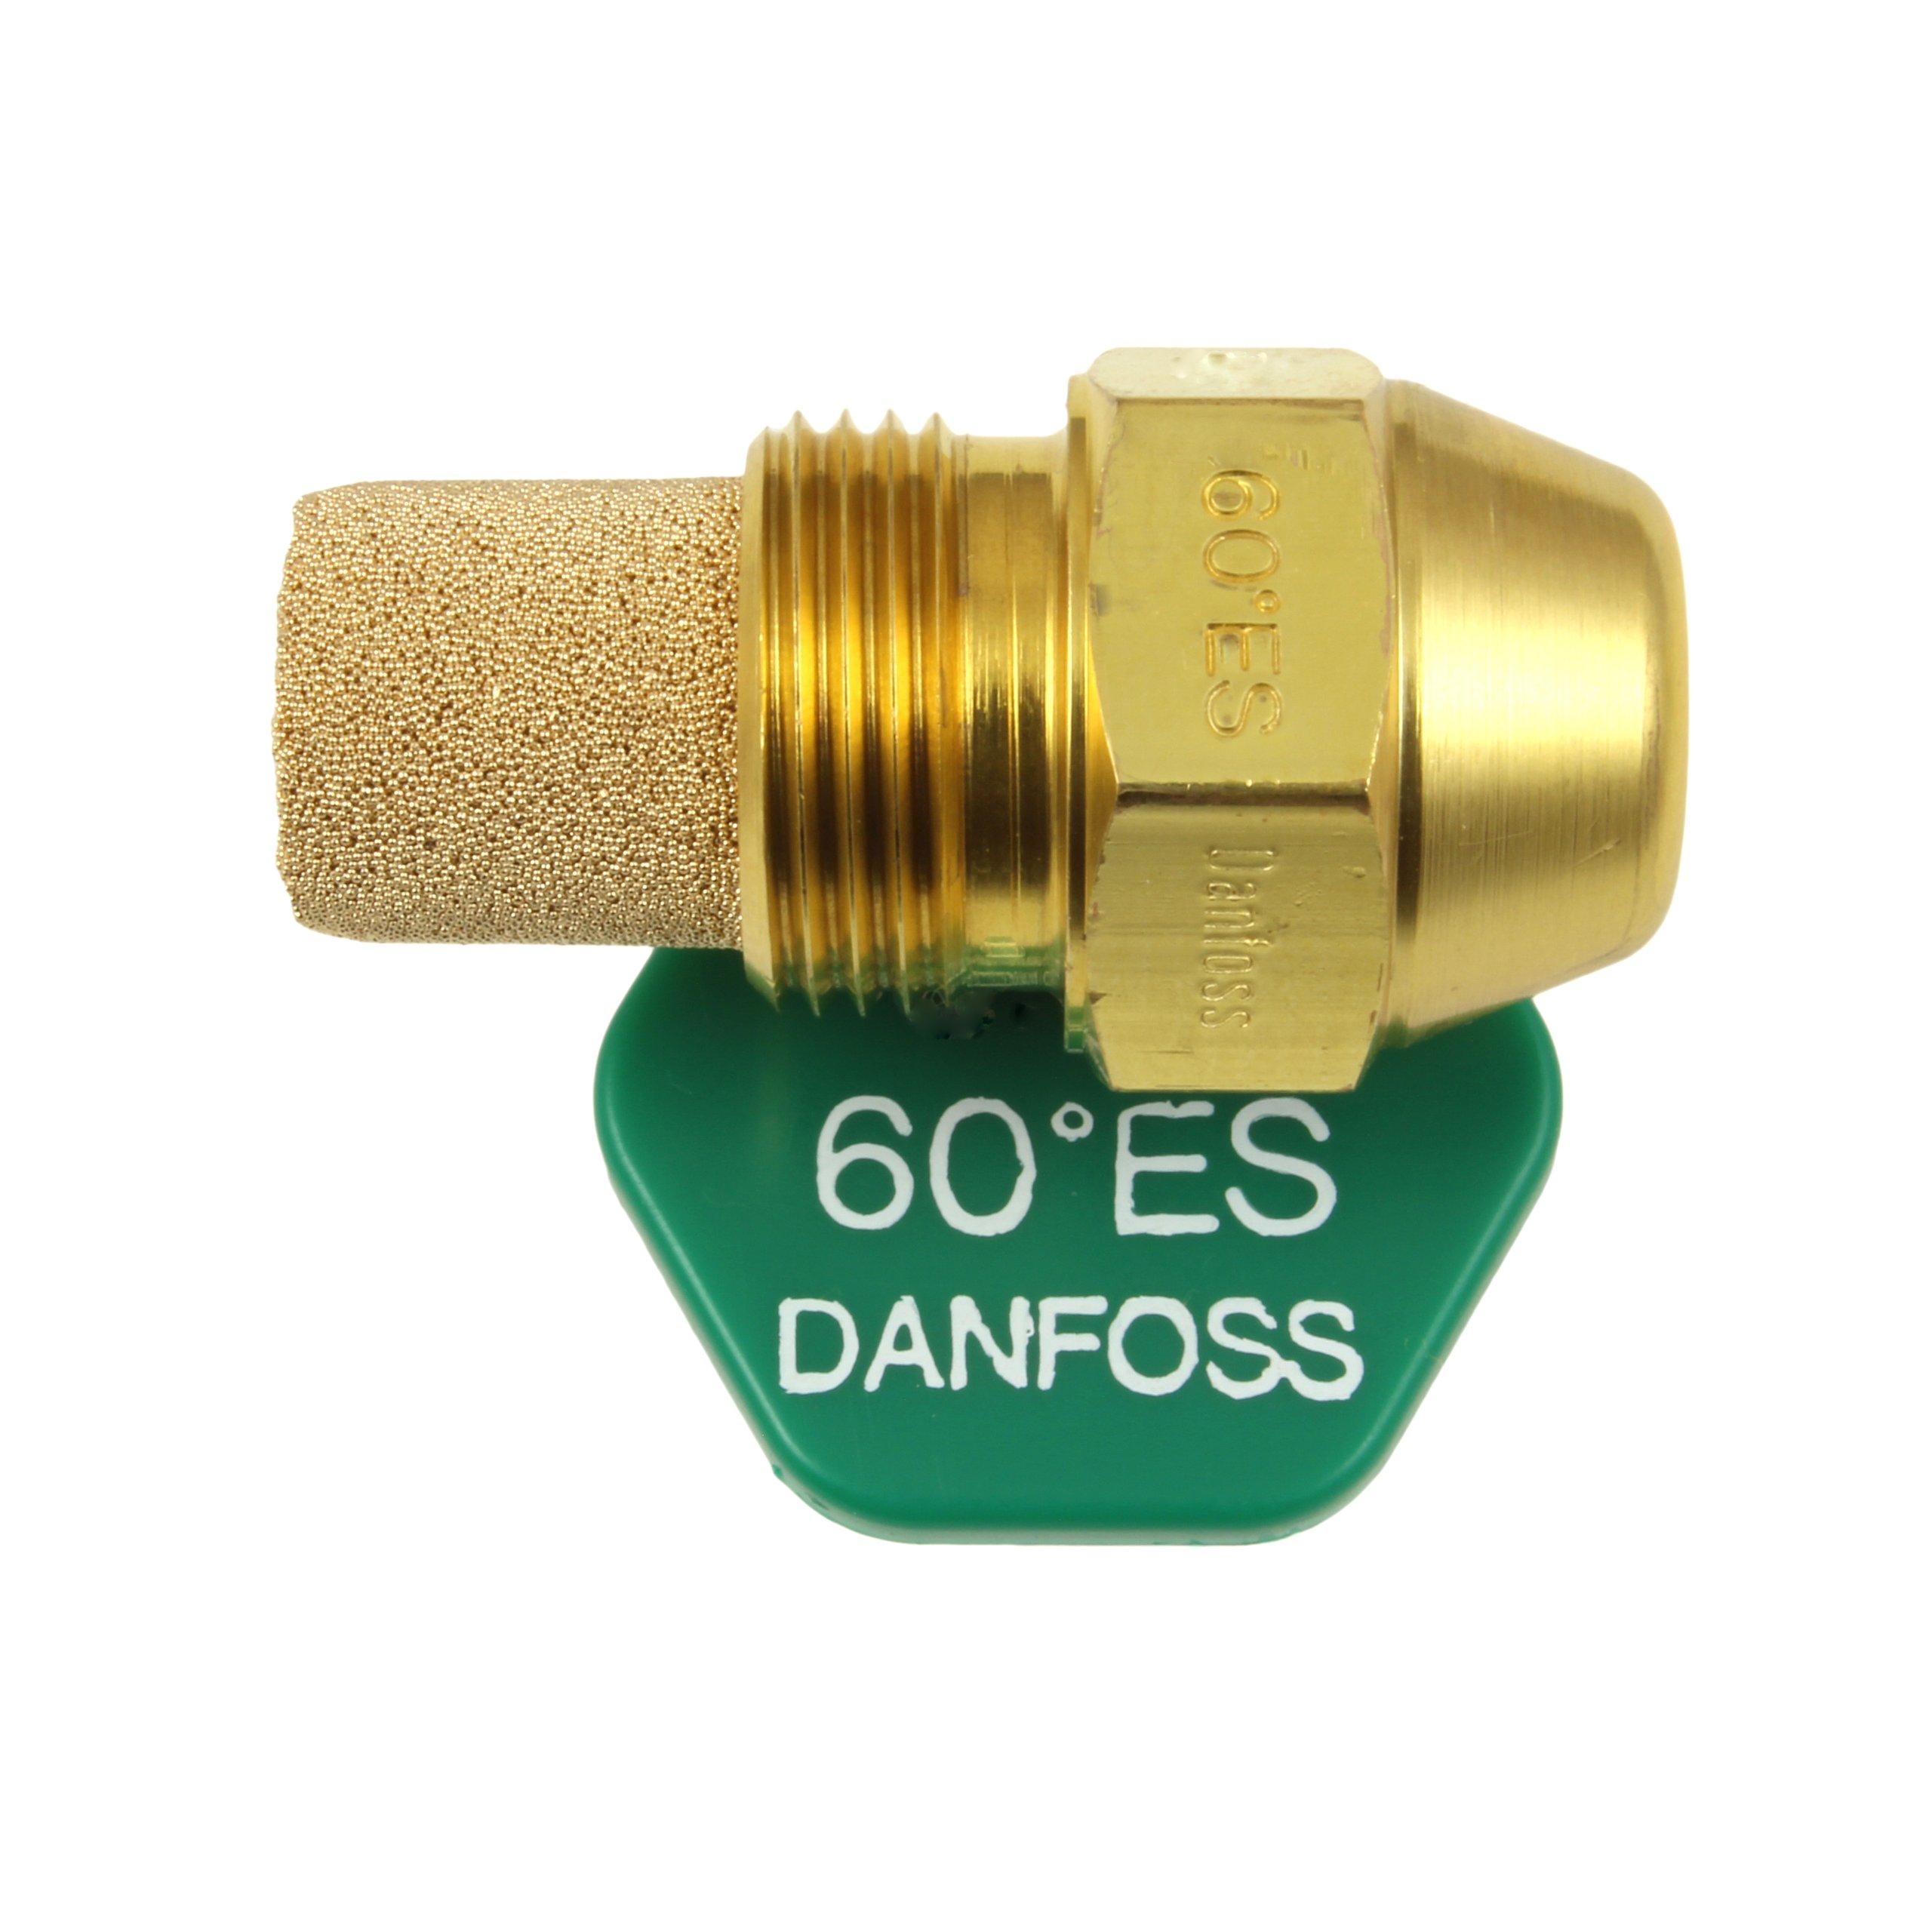 Danfoss Aceite Despedida Hervidor Quemador Boquilla 0.75 x 60 ES USgal//h /° Grados Espray Estampado Calefacci/ón Jet 2.25 Kg//h